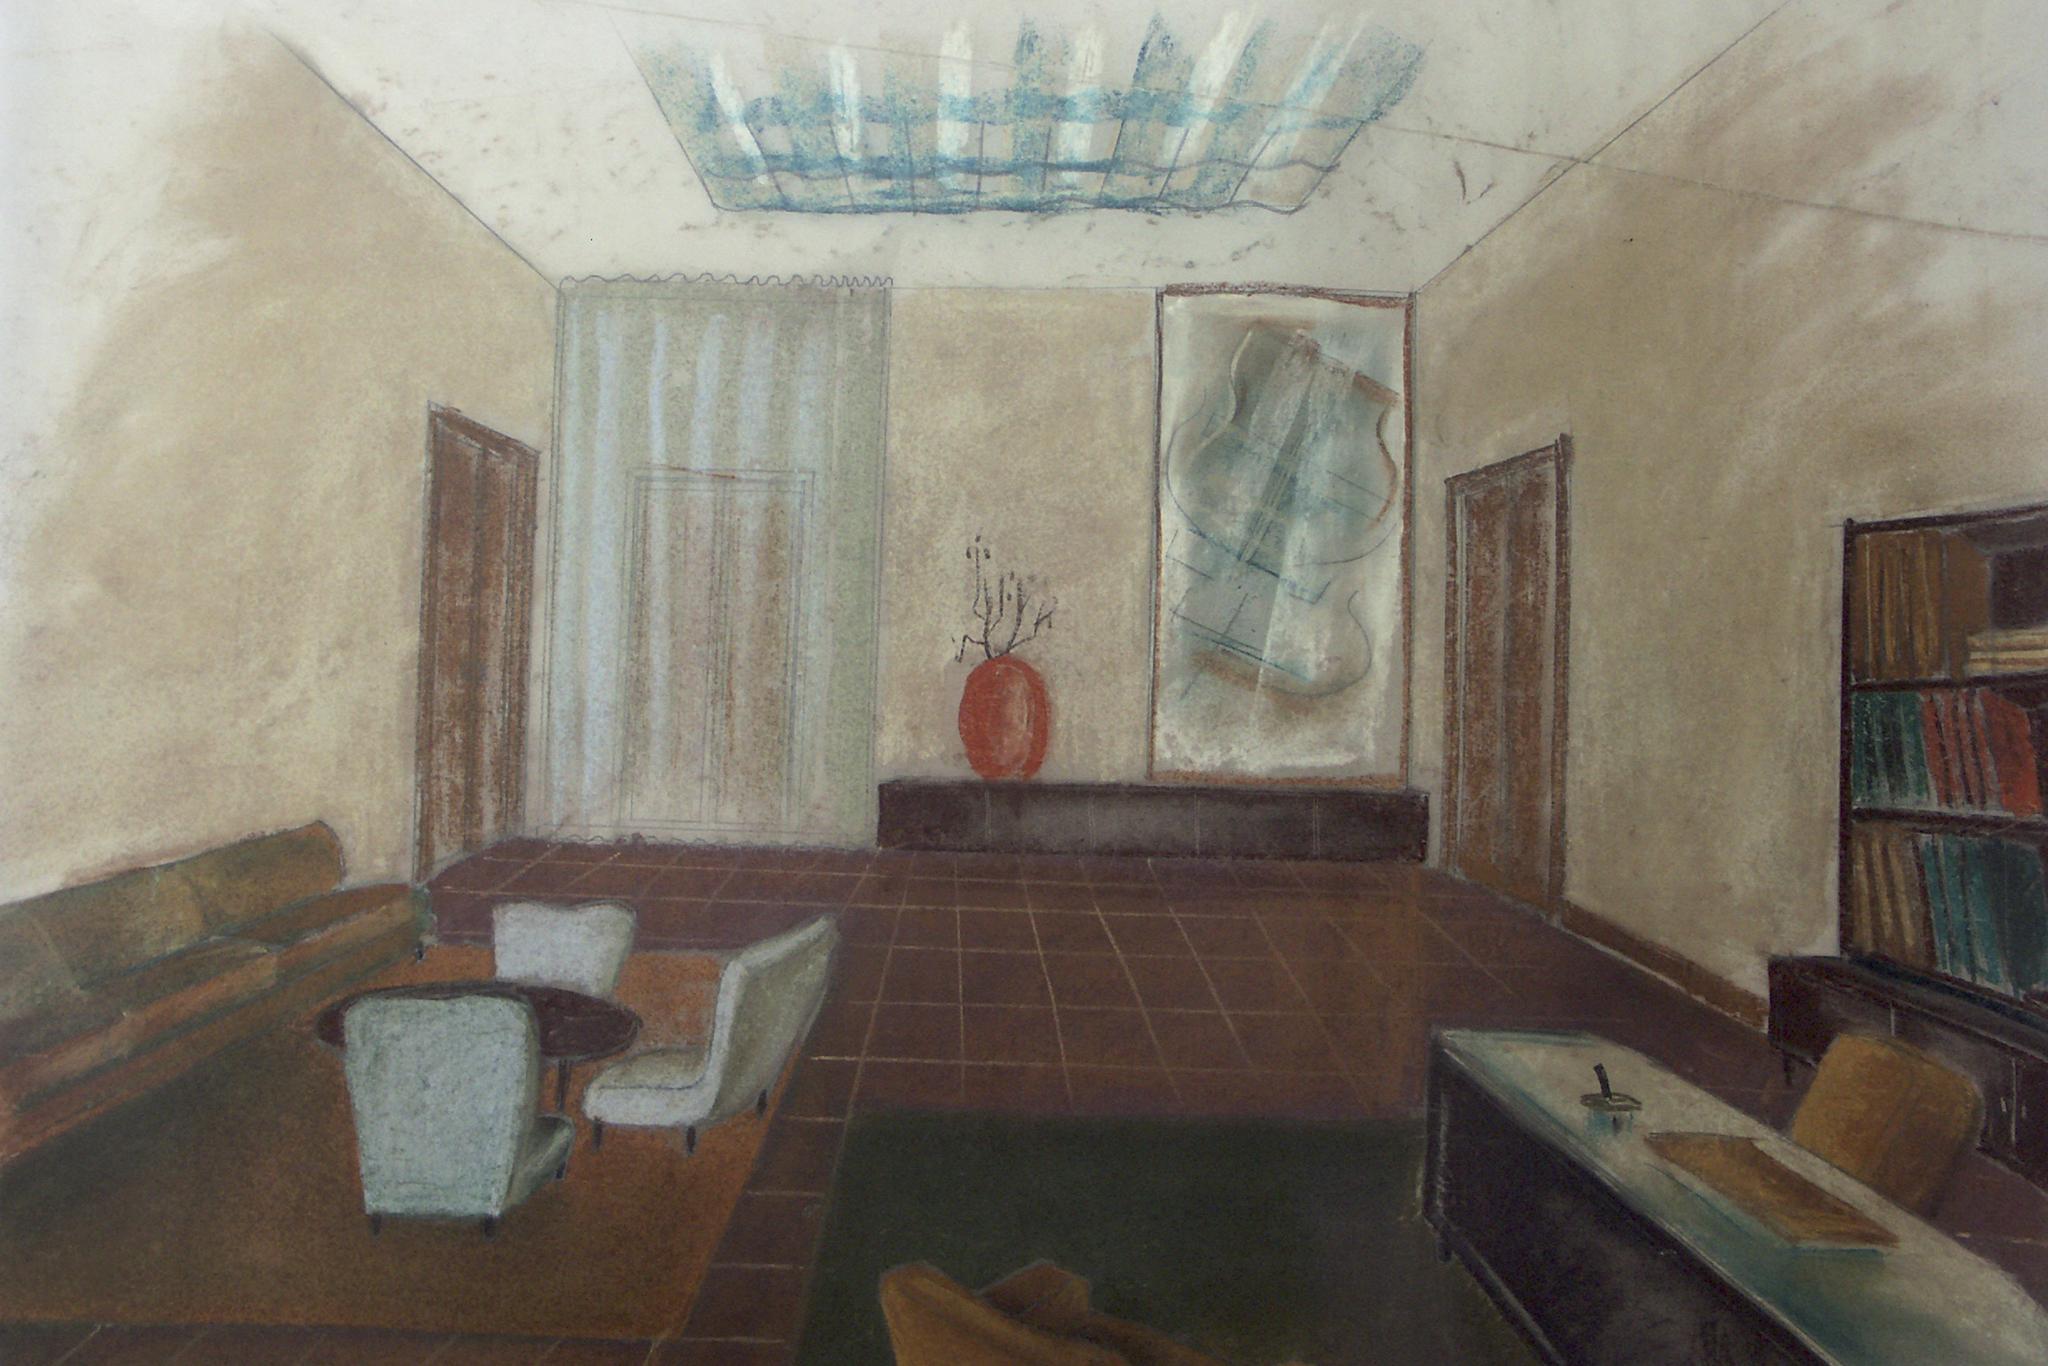 A sketch by Guglielmo Ulrich.